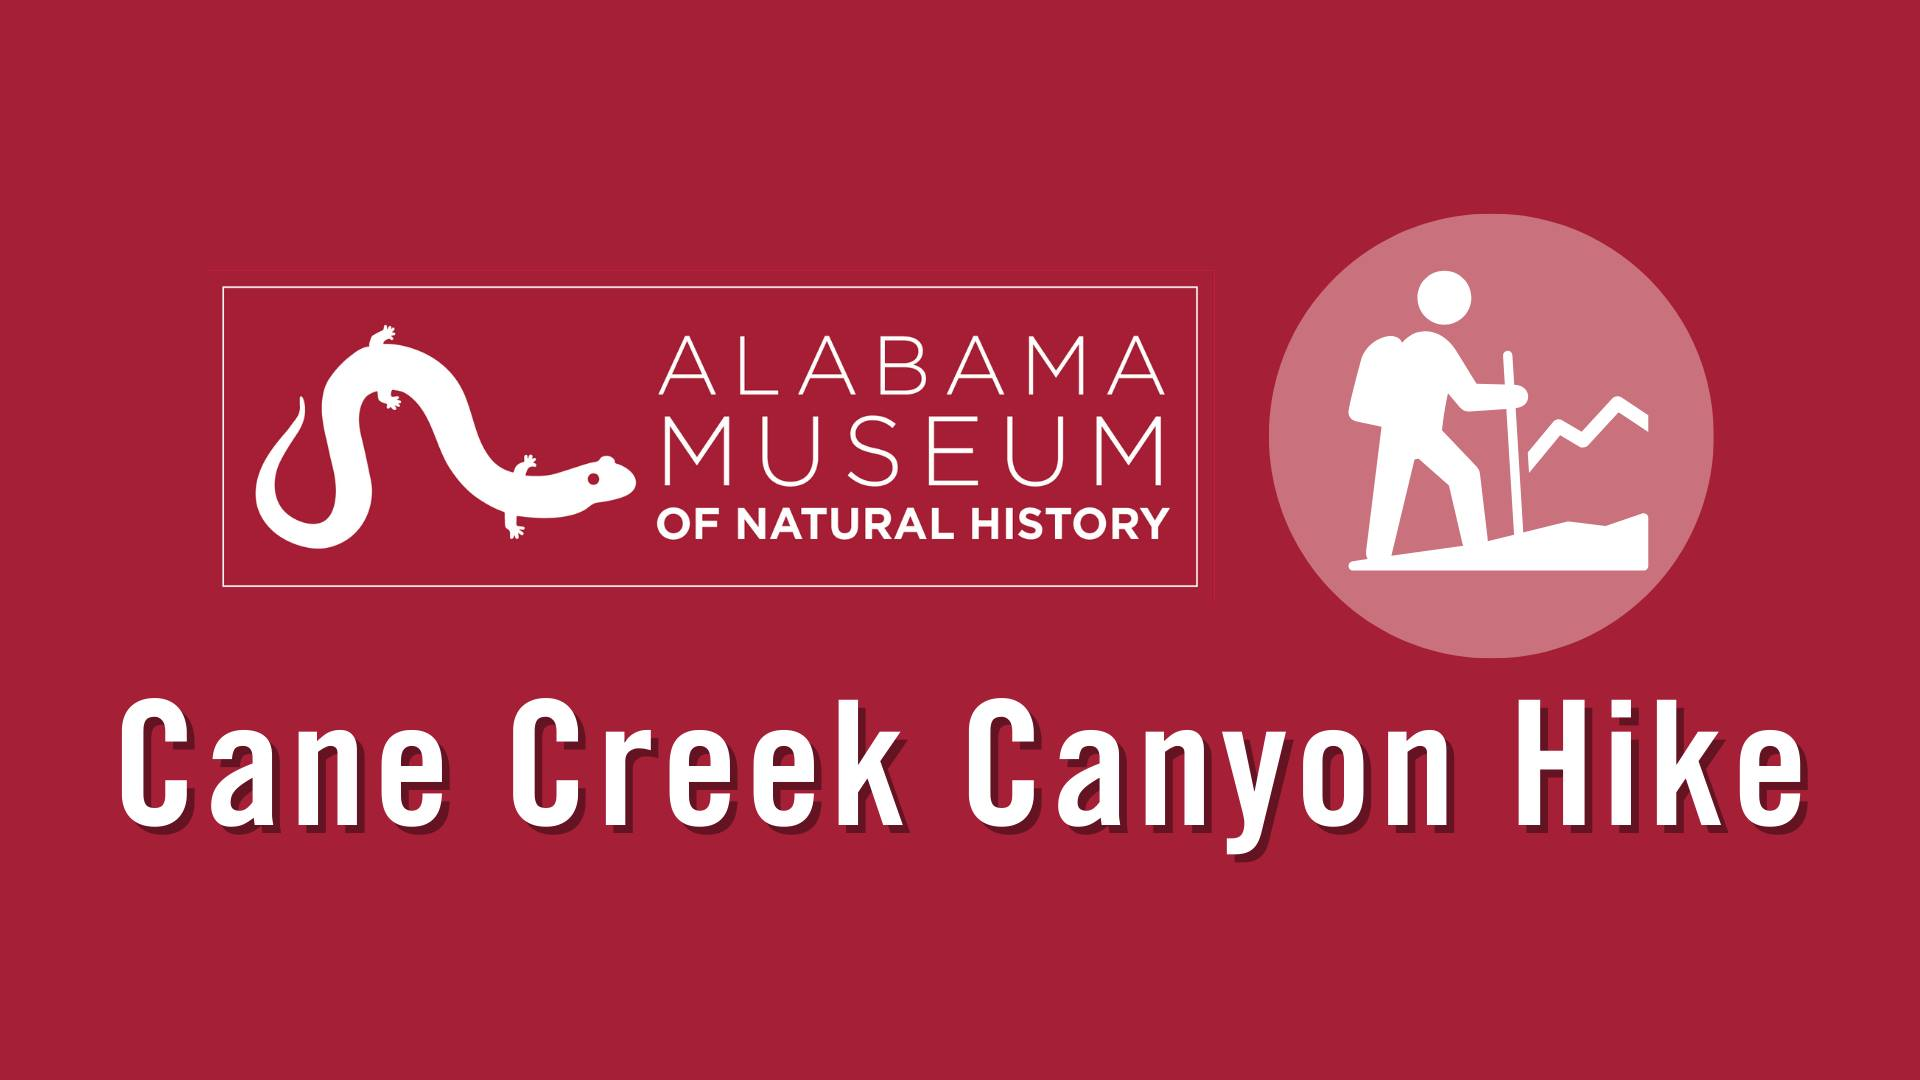 Cane Creek Canyon Hike